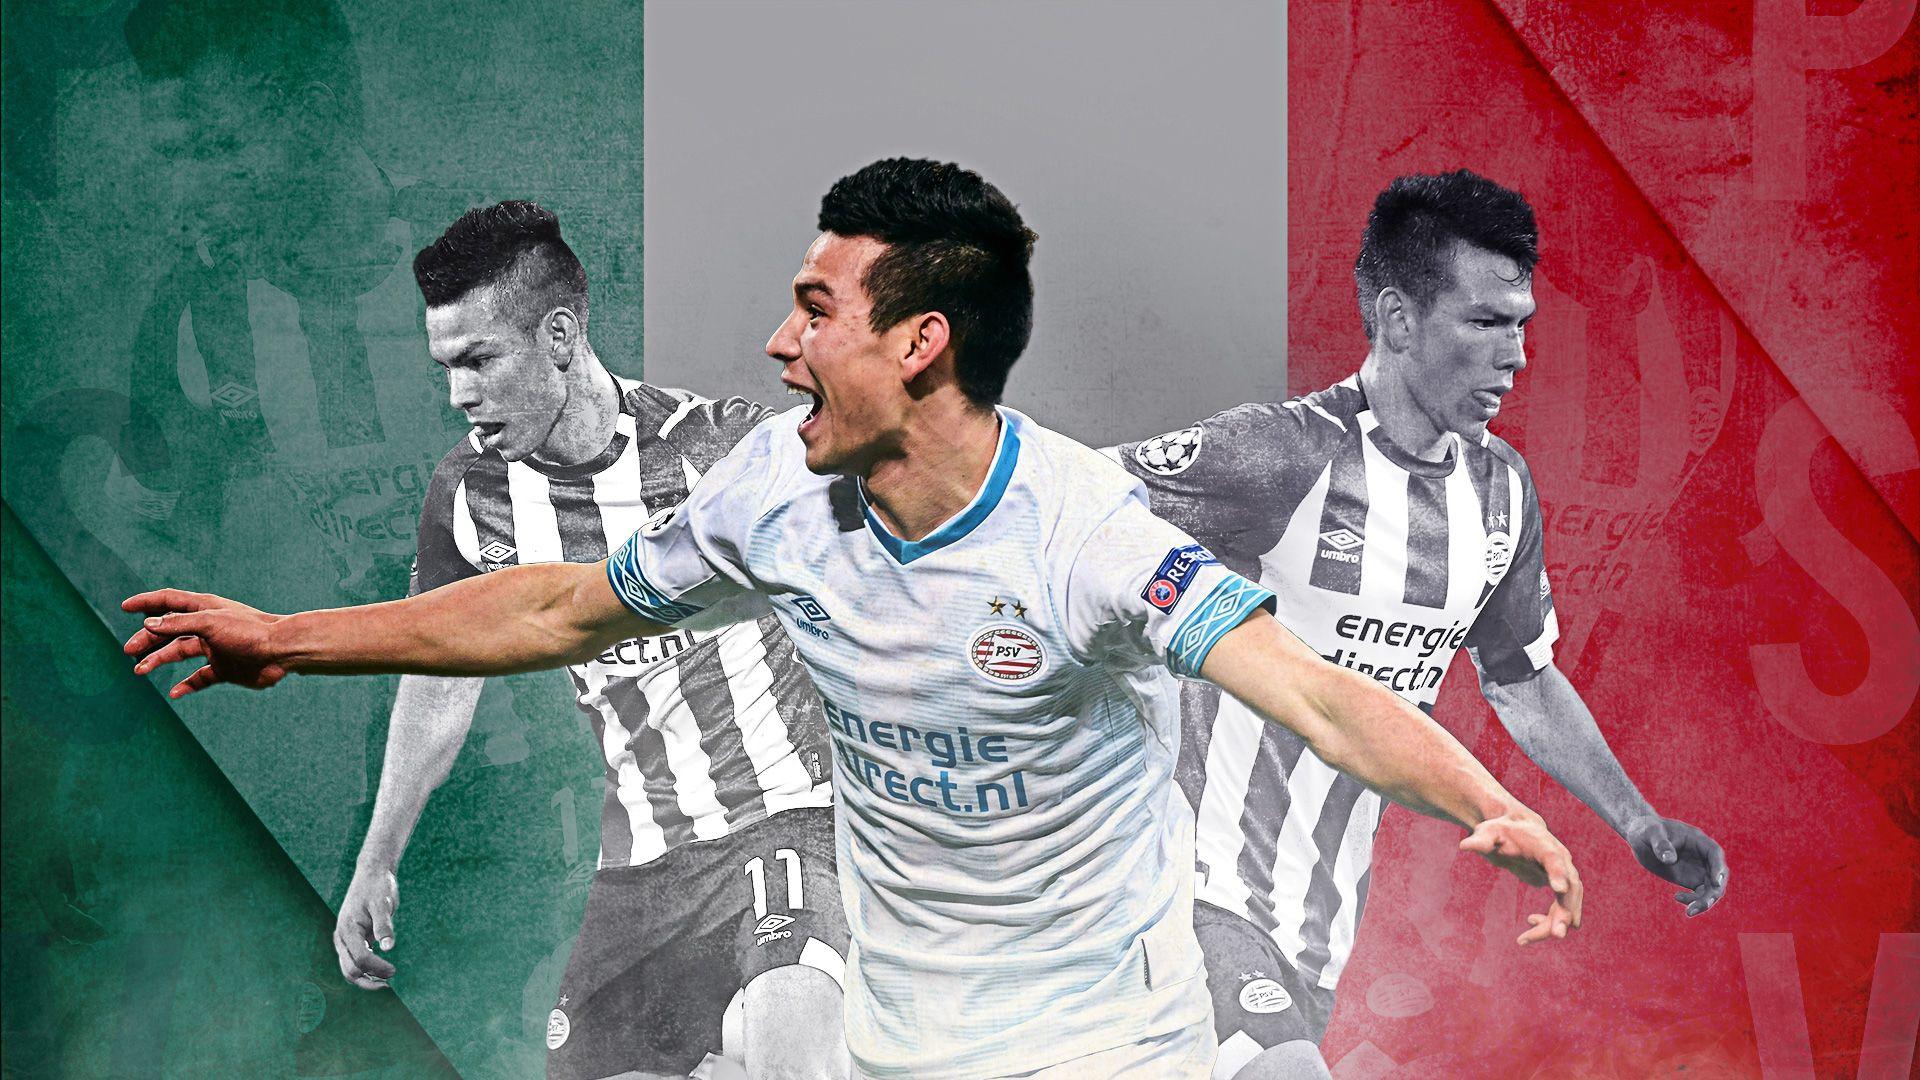 premium selection ec29c 727a3 Chucky Lozano: PSV phenomenon with world at his feet